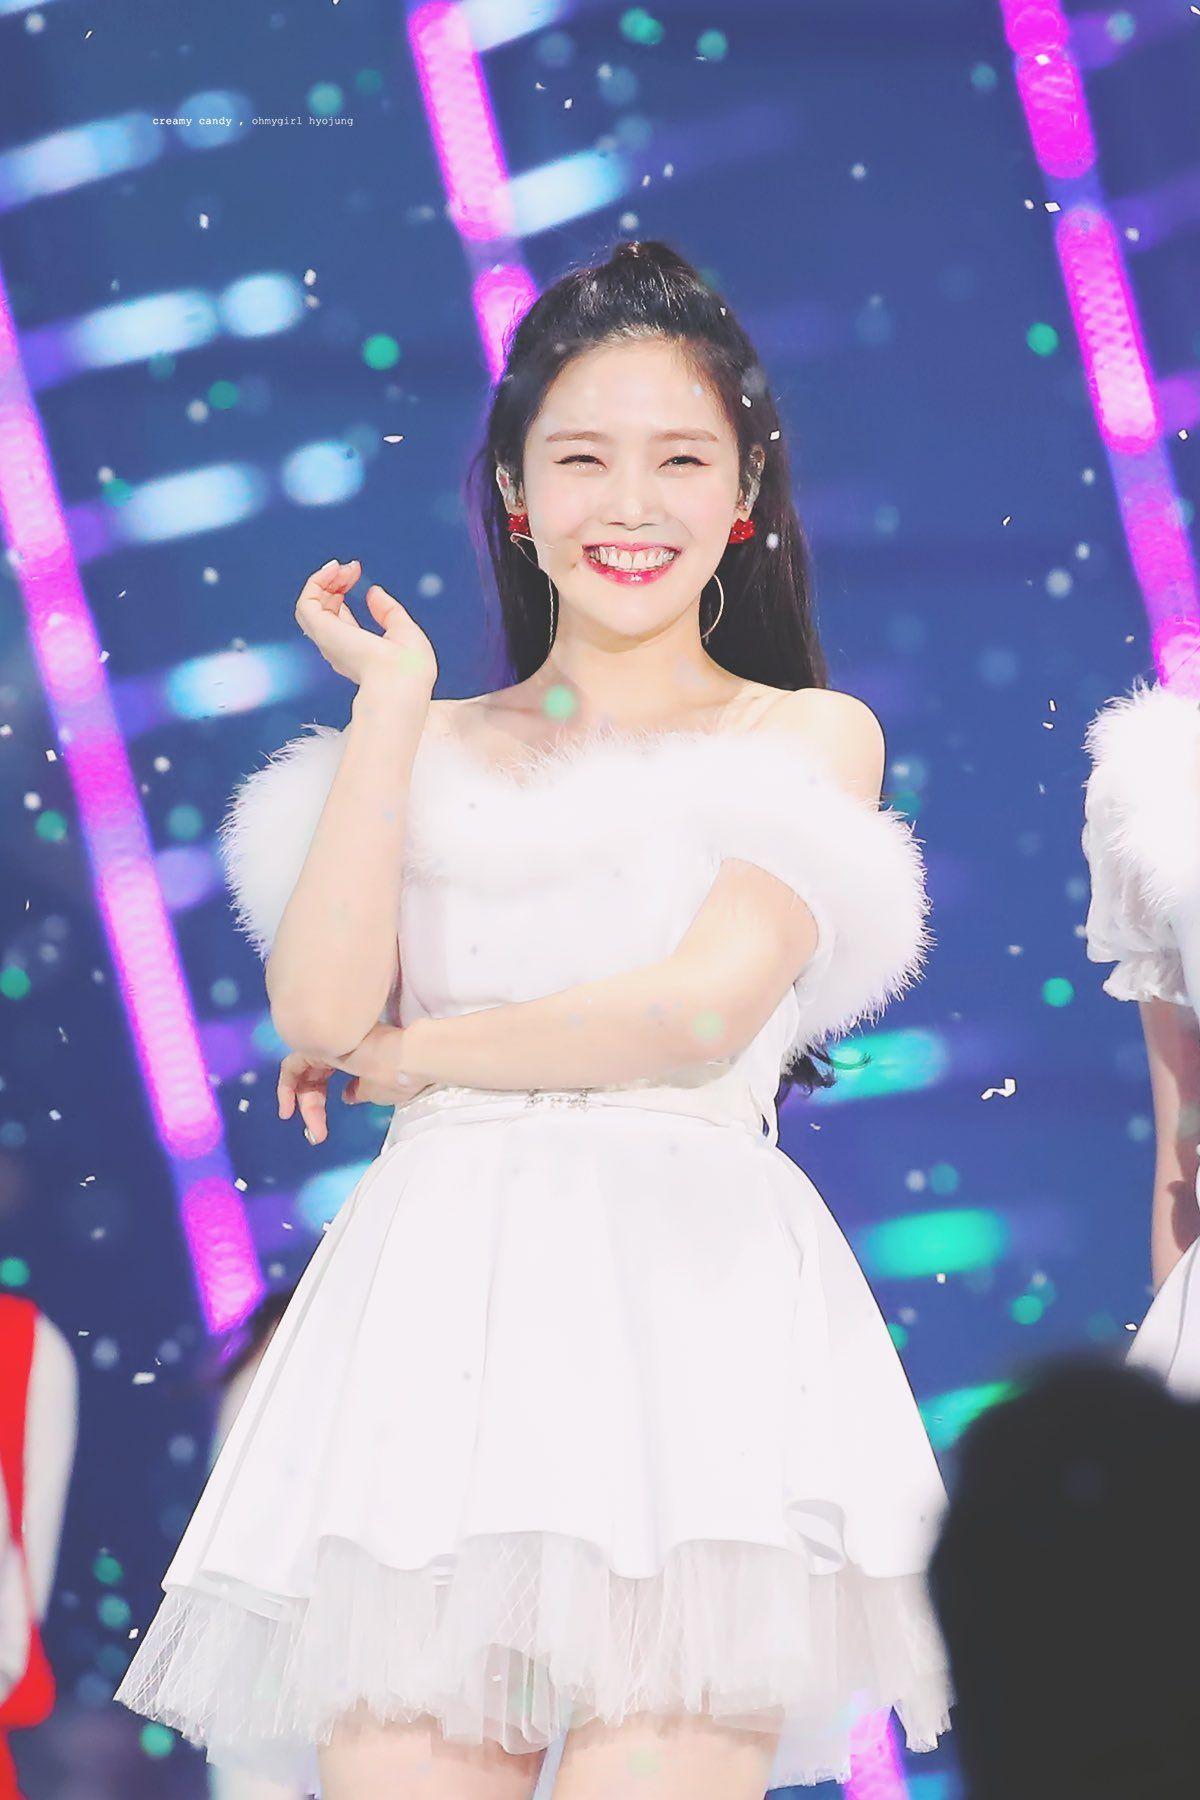 Hyojung kpop kdrama bts exo kpoparmy Girl, Oh my